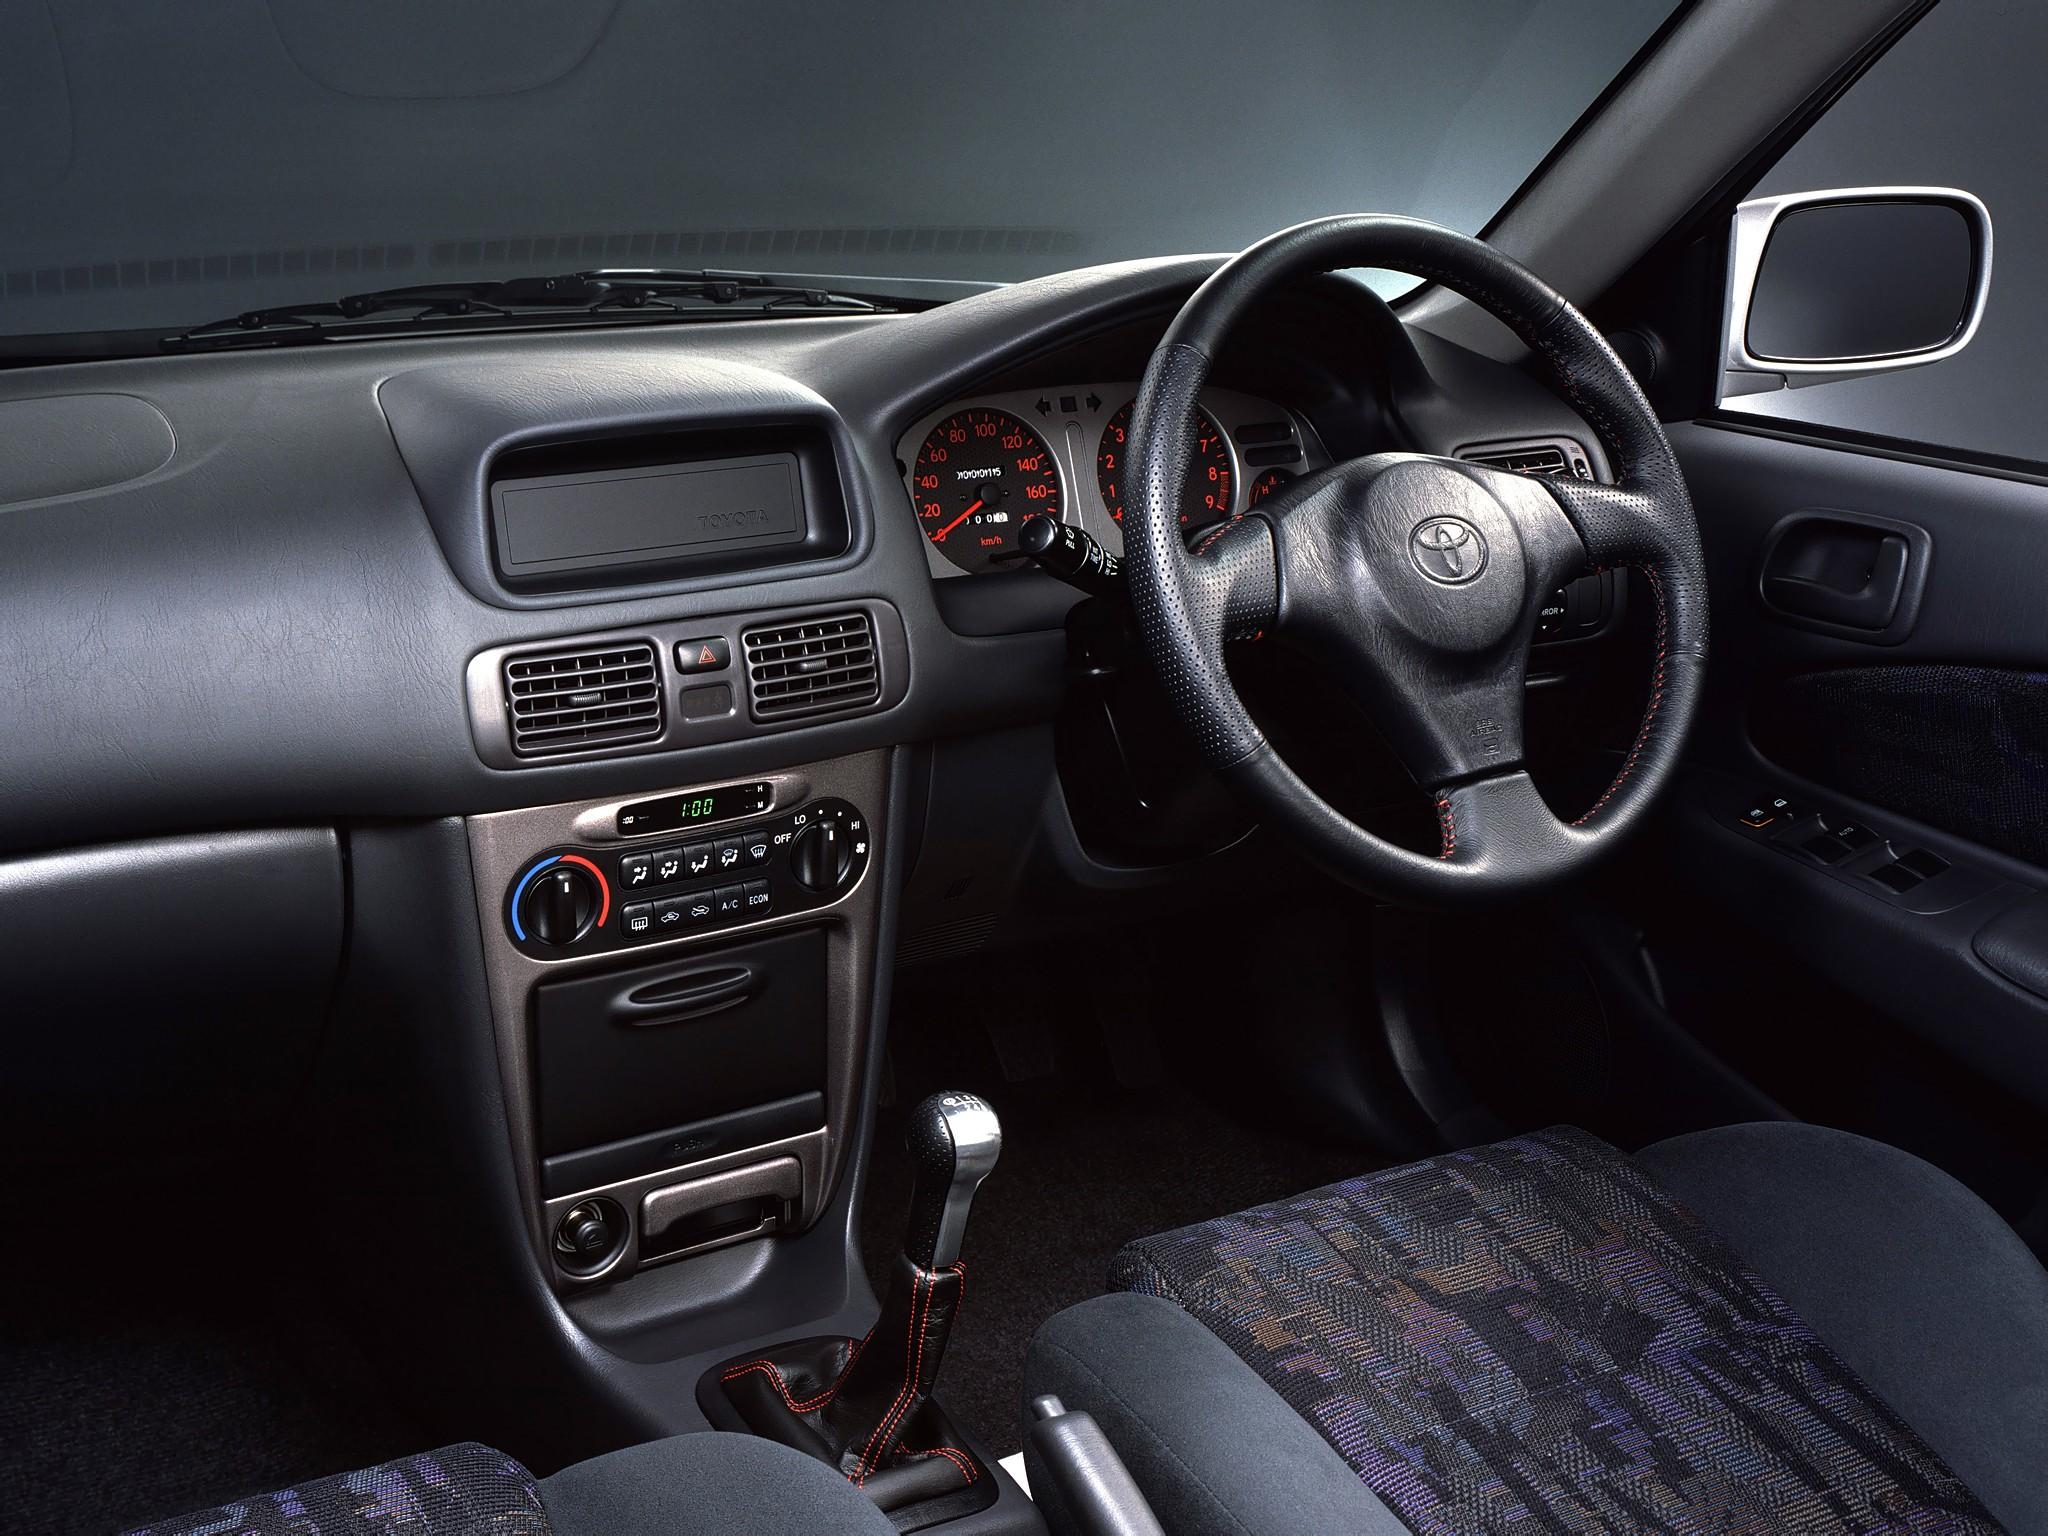 TOYOTA Corolla Sedan Specs Amp Photos 1997 1998 1999